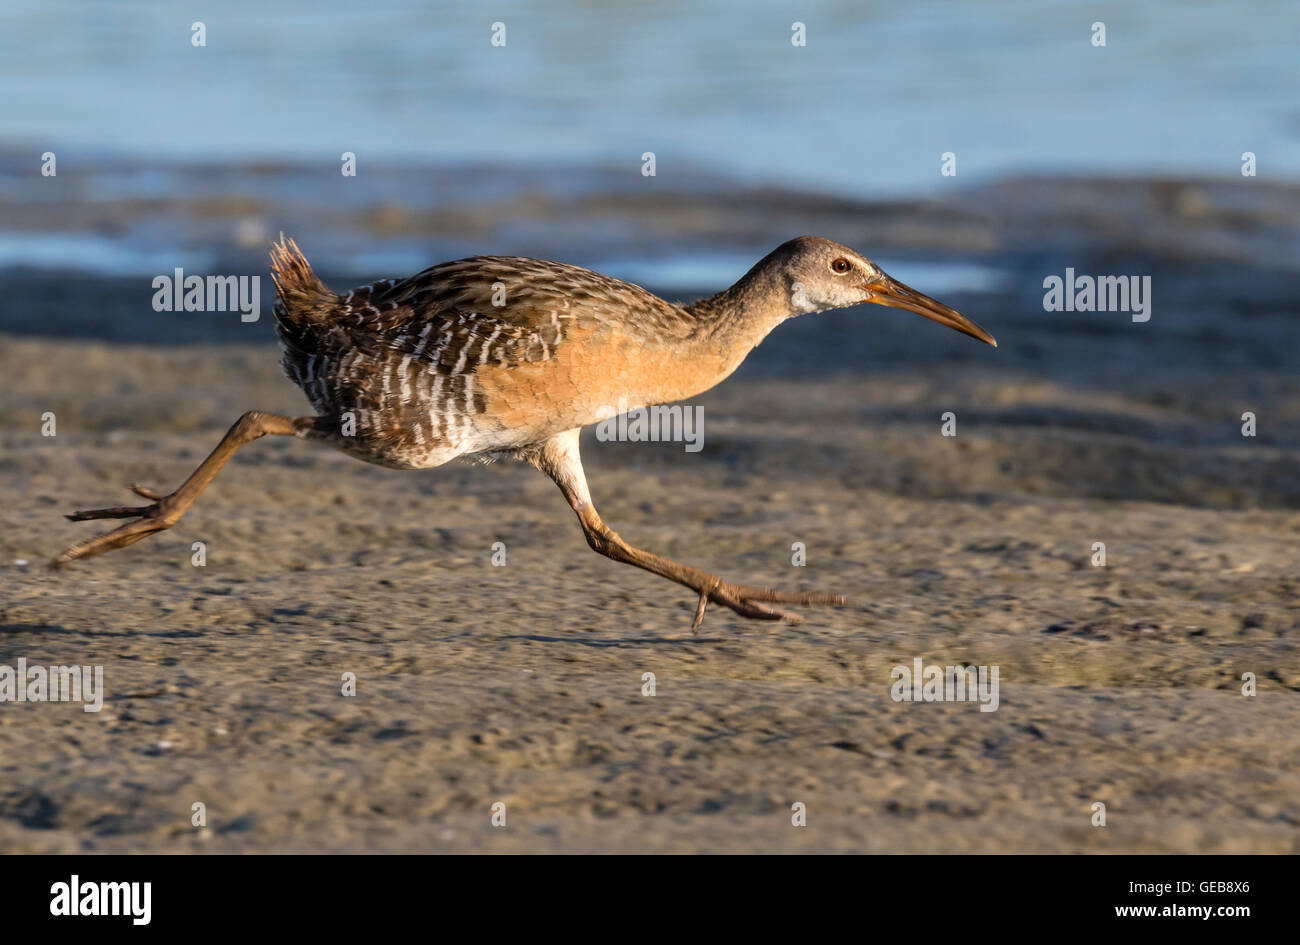 Clapper rail (Rallus crepitans) running along the edge of tidal marsh, Galveston, Texas, USA. - Stock Image